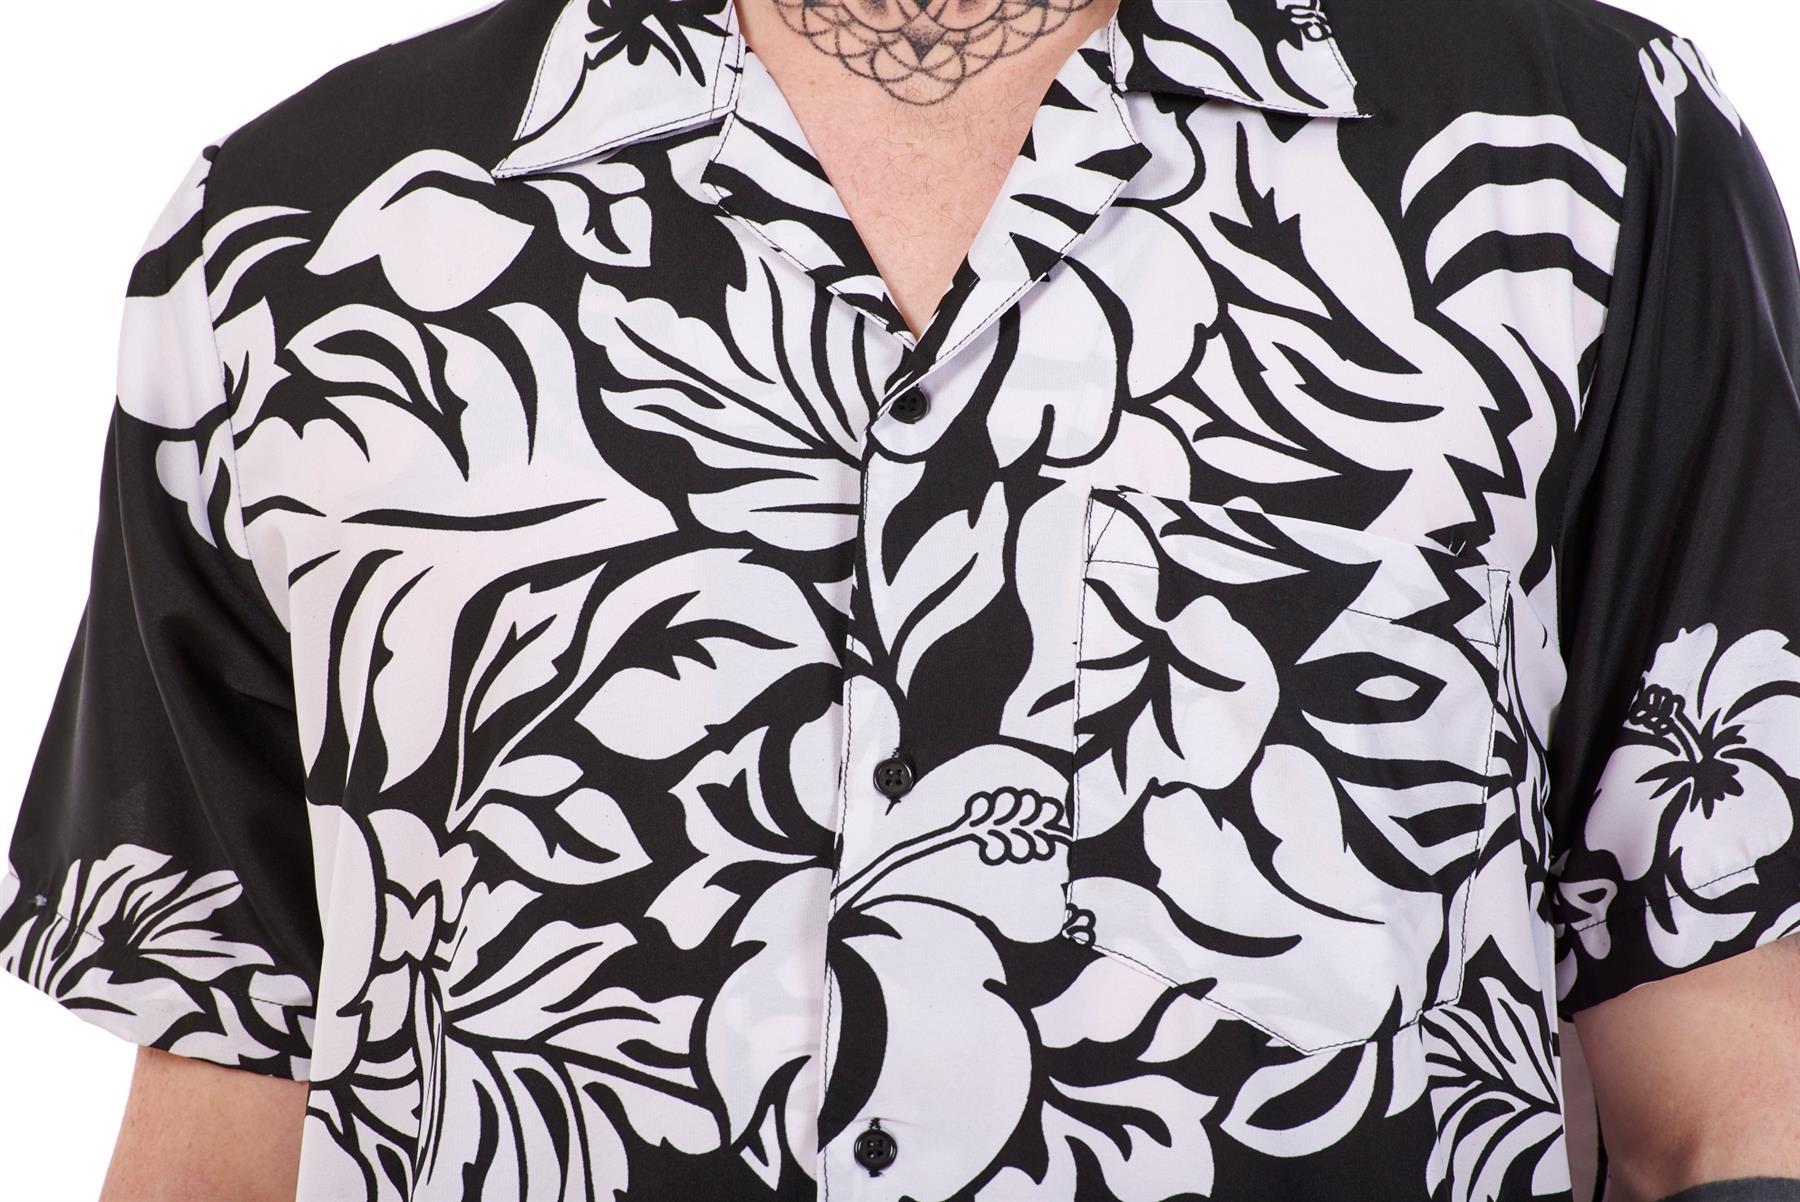 Mens-Hawaiian-Shirt-Multi-Colors-Print-Regular-Big-Size-Summer-Fancy-Dress-M-5XL thumbnail 6